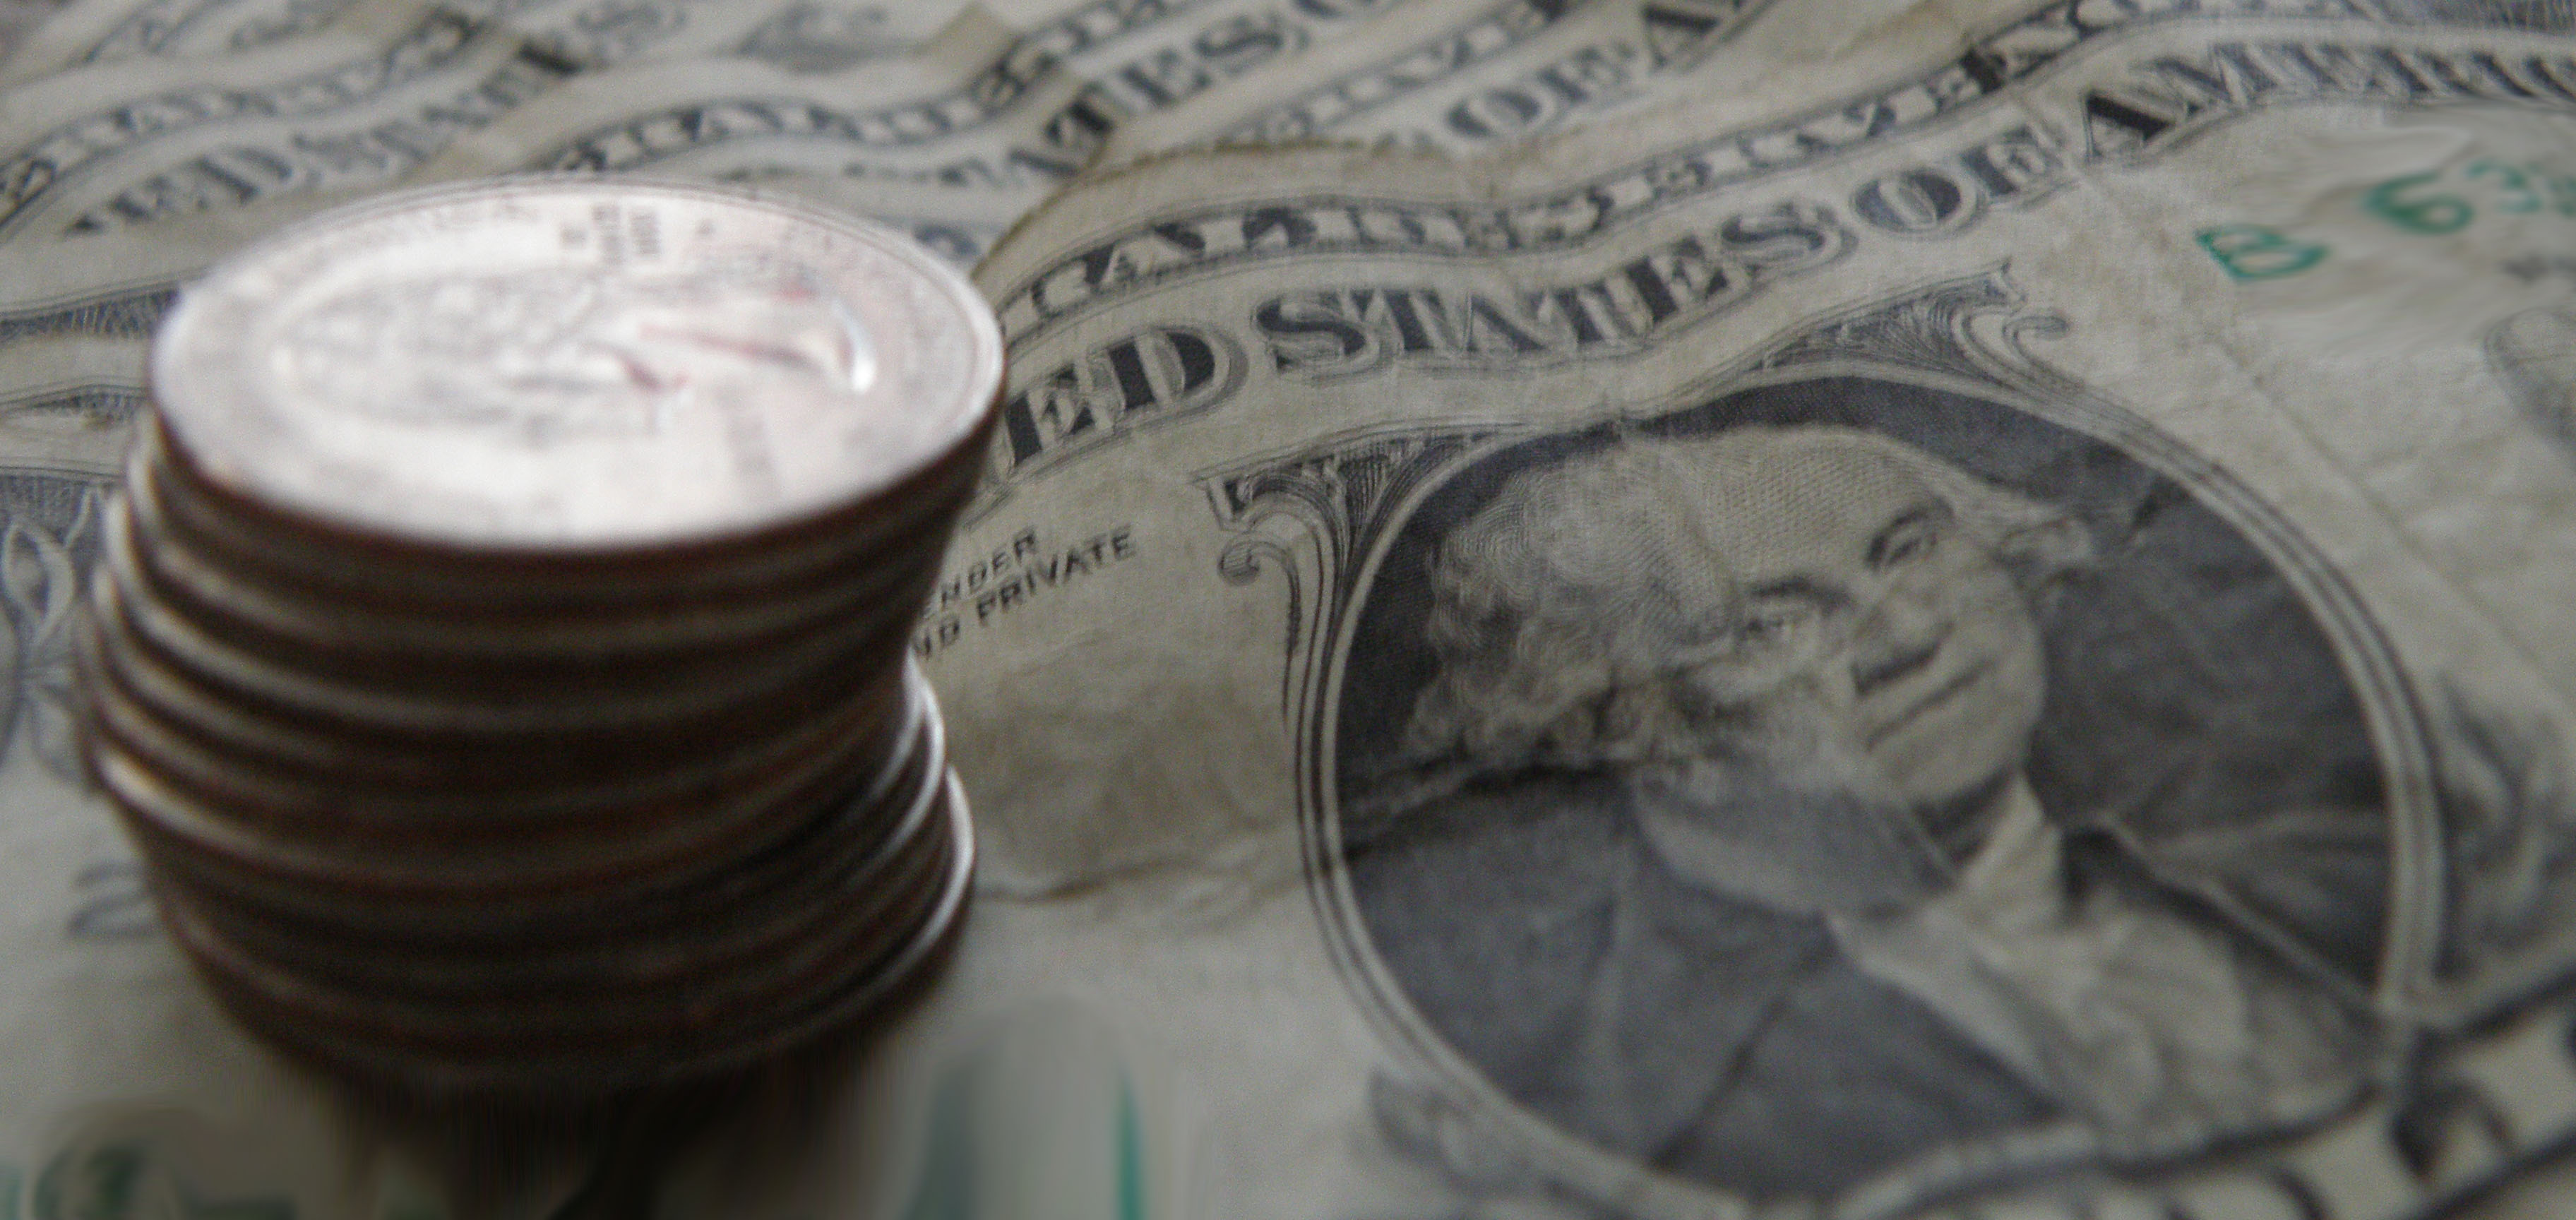 5 Ways to Cut Costs – Week 1